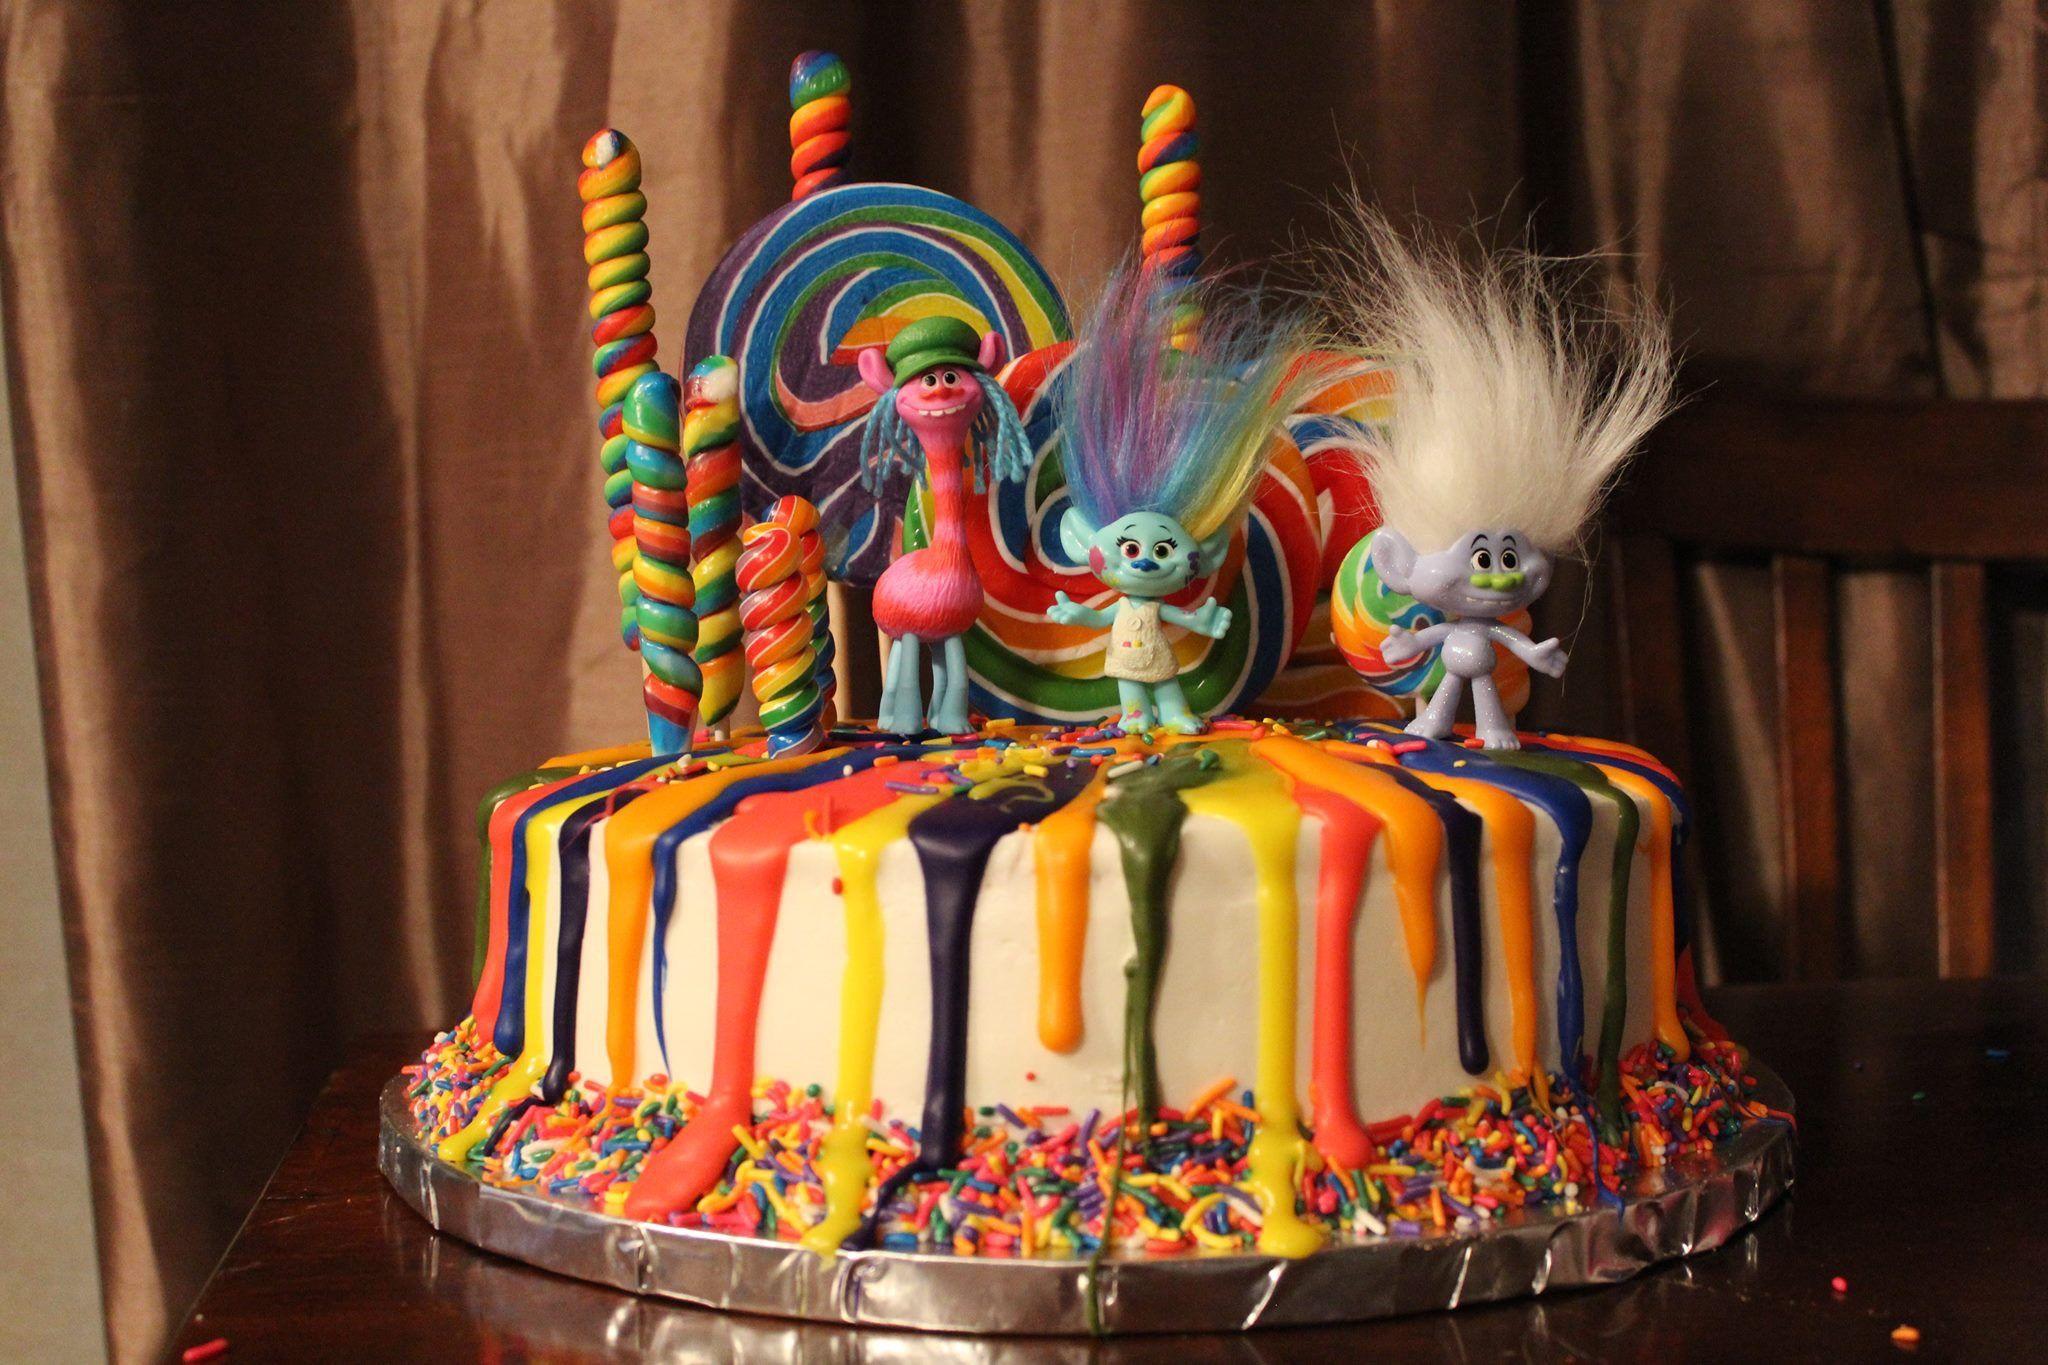 Trolls and Lollipops cake | Lollipop cake, Cake, Cake ...